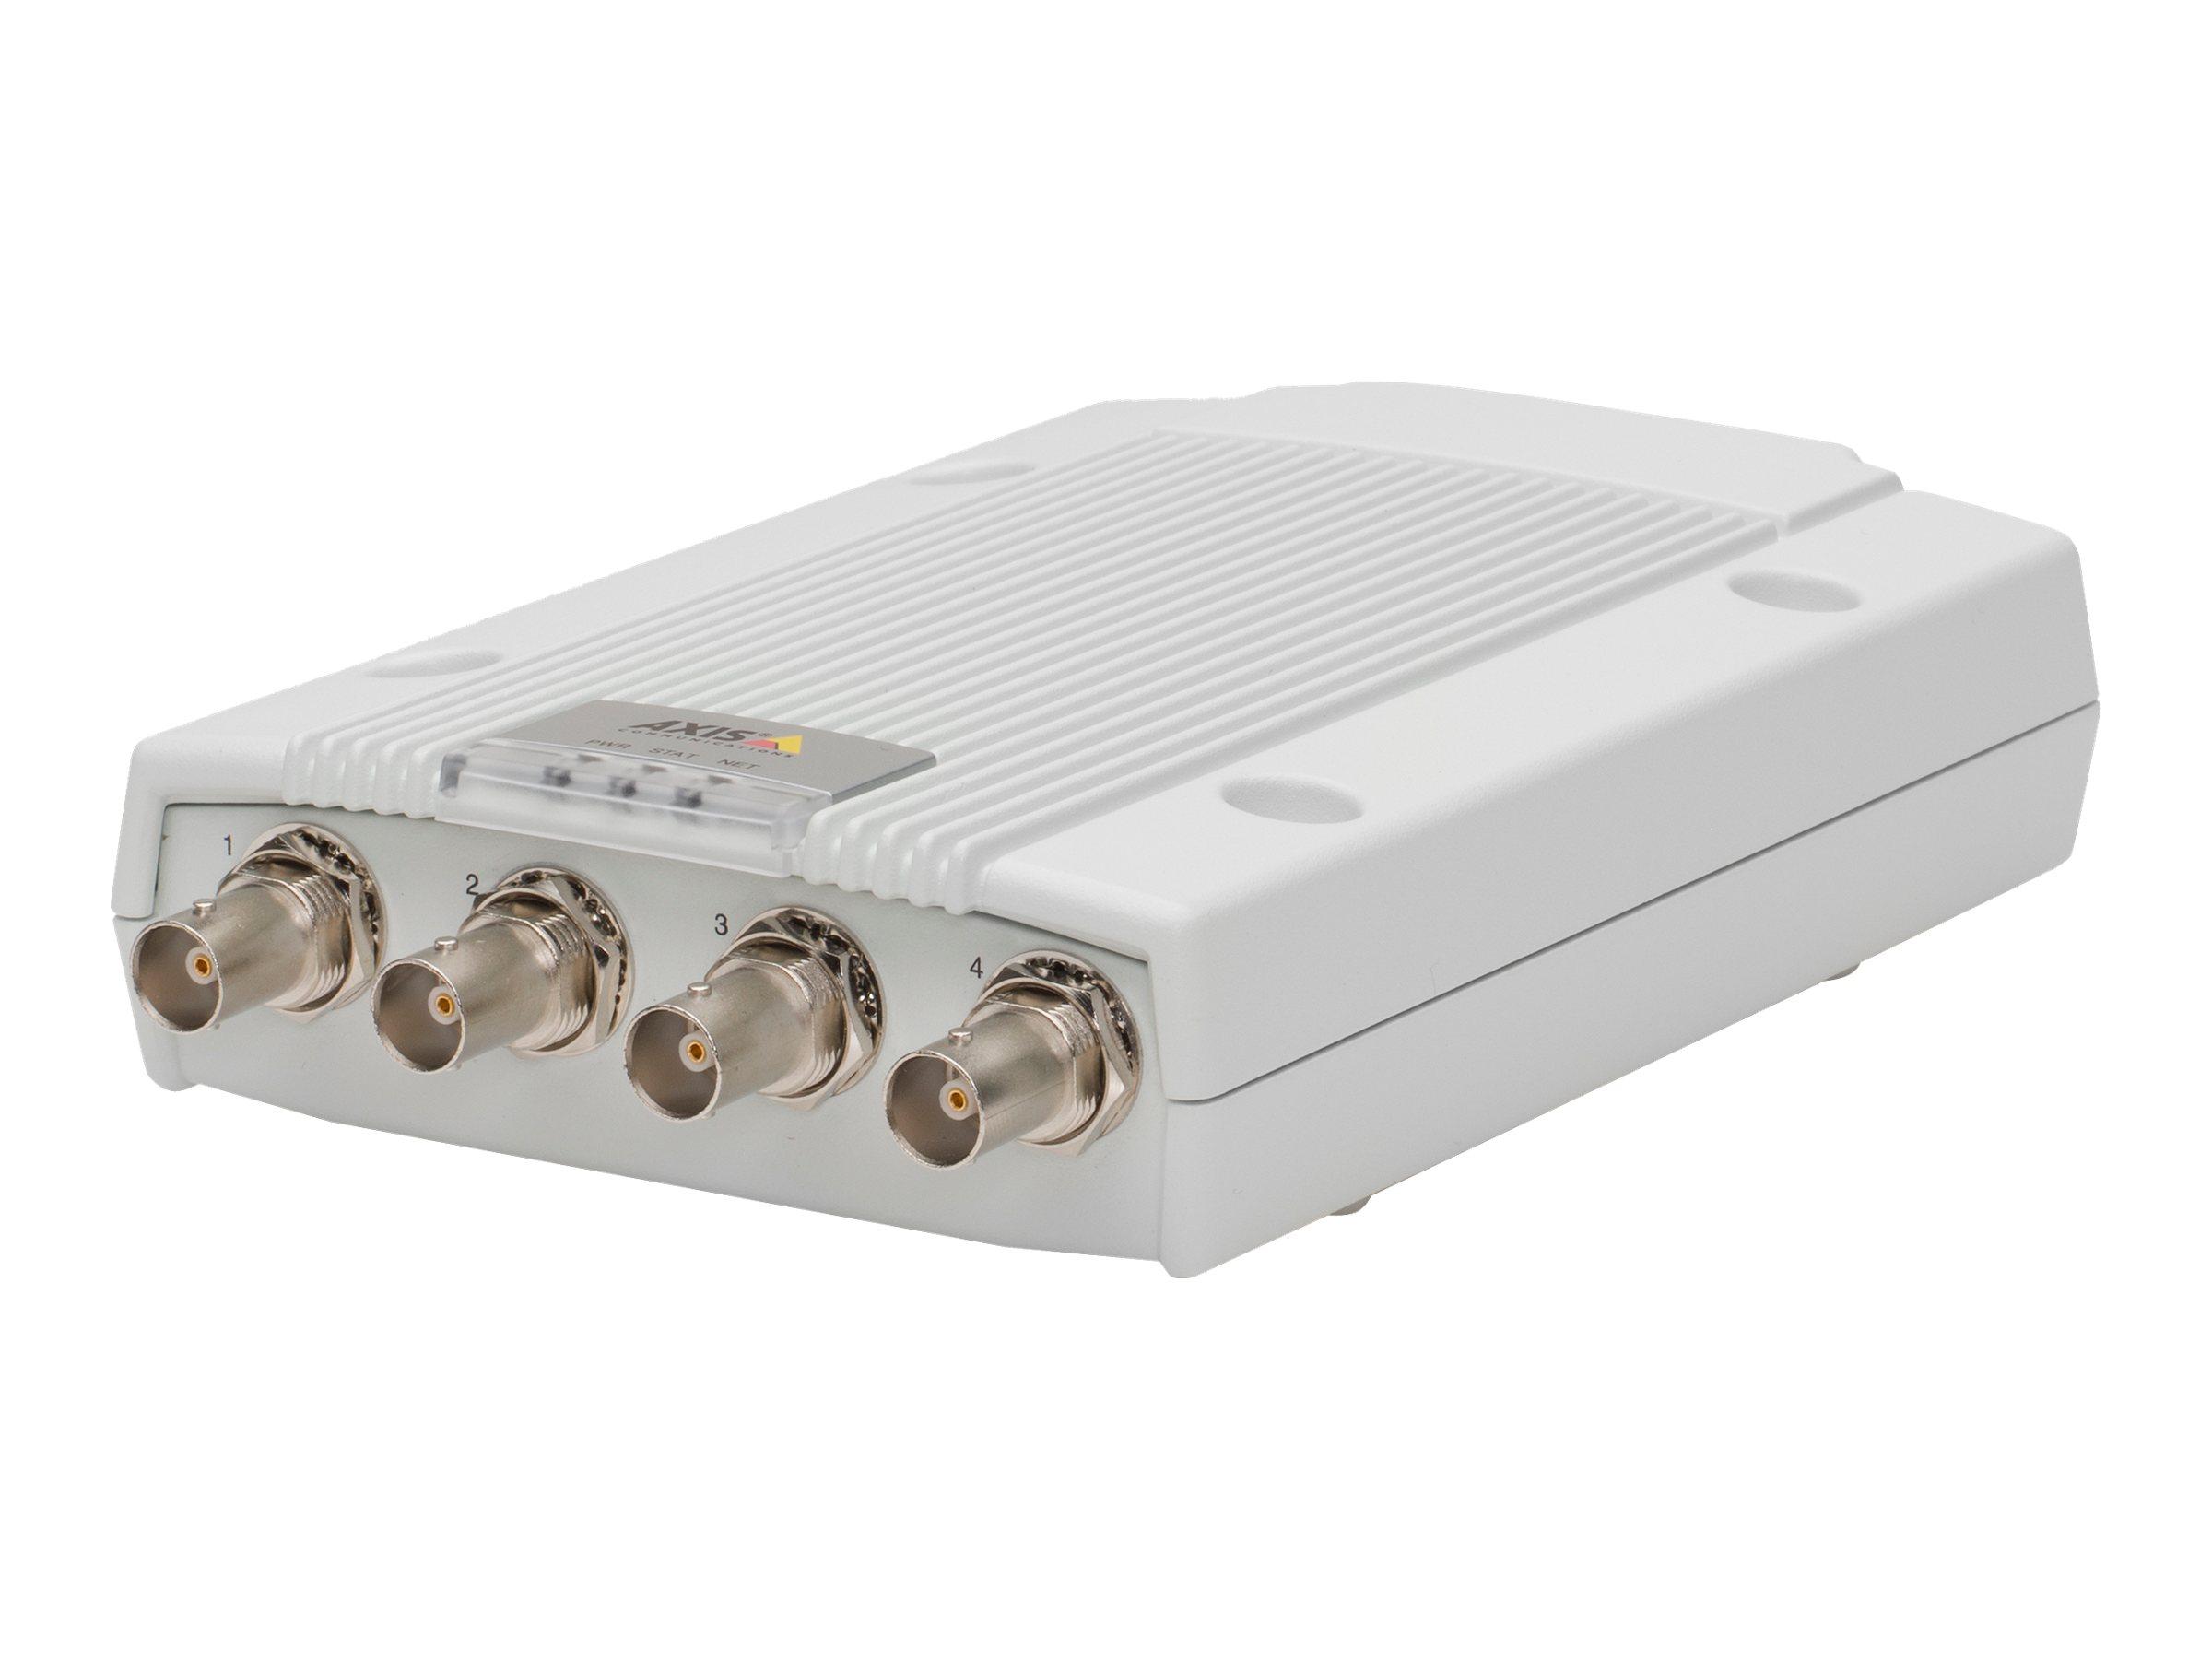 AXIS M7014 Video Encoder - Video-Server - 4 Kanäle (Packung mit 10)